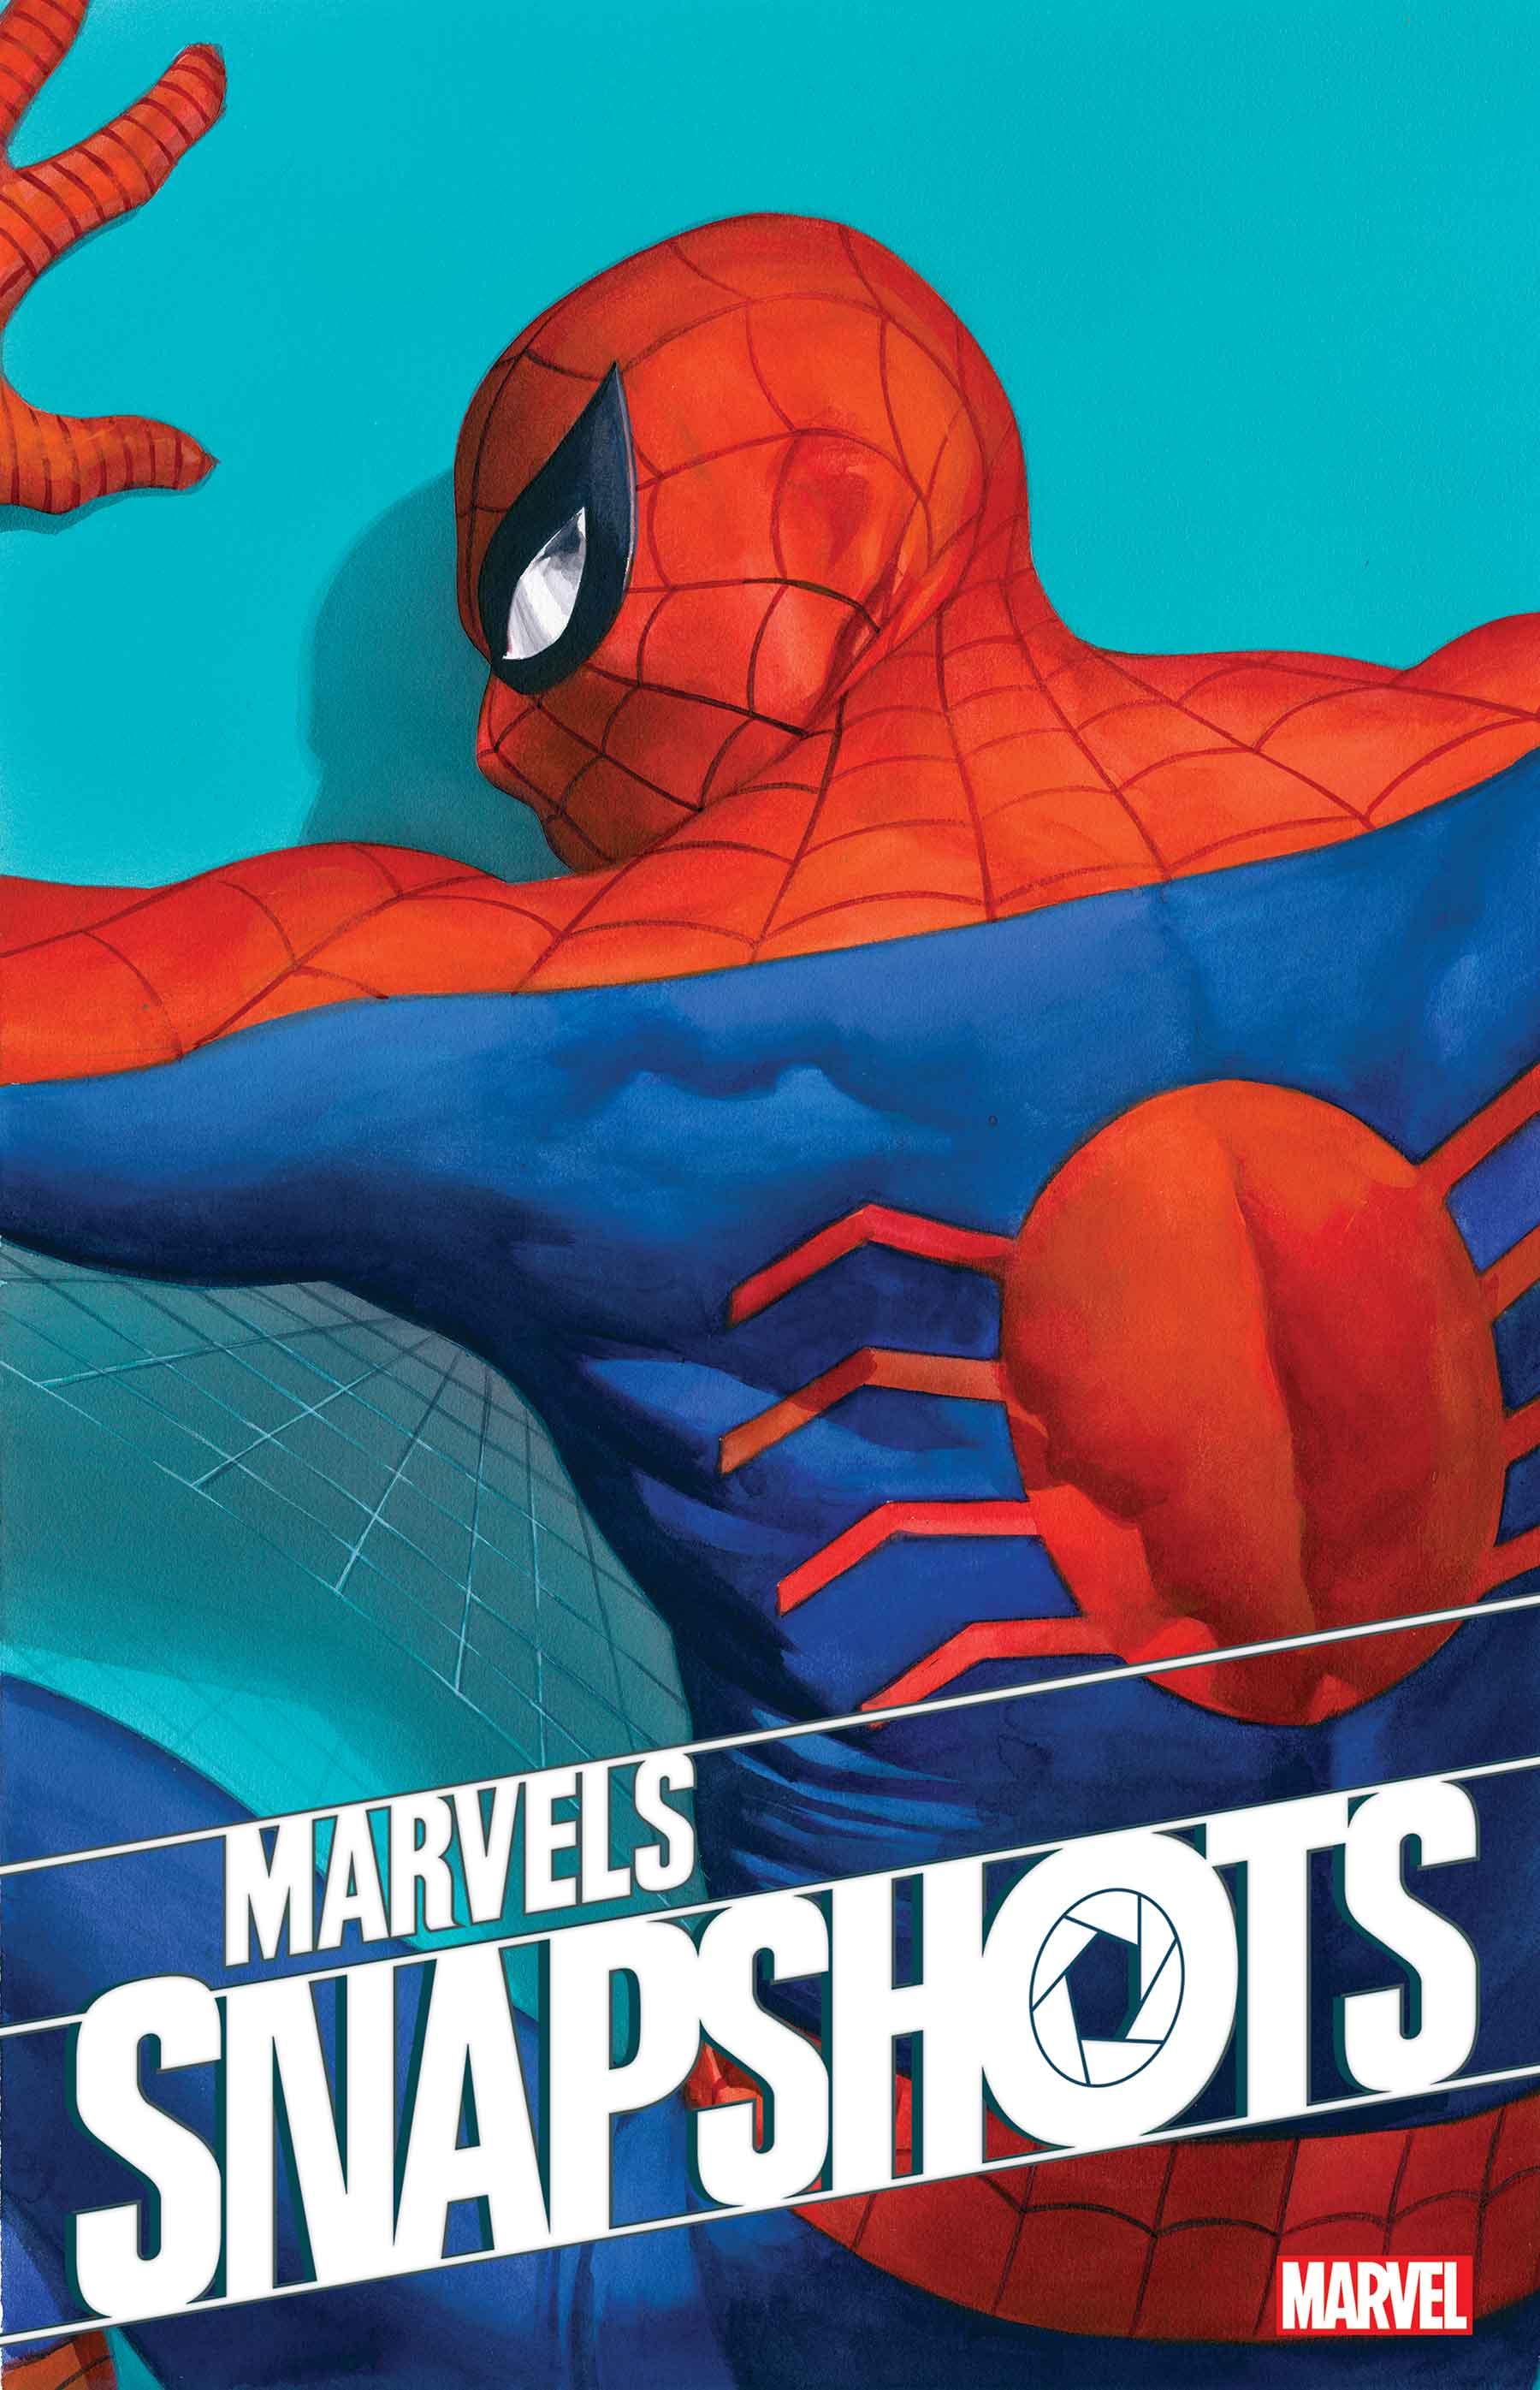 SPIDER-MAN: MARVELS SNAPSHOTS 1 (2029) #1